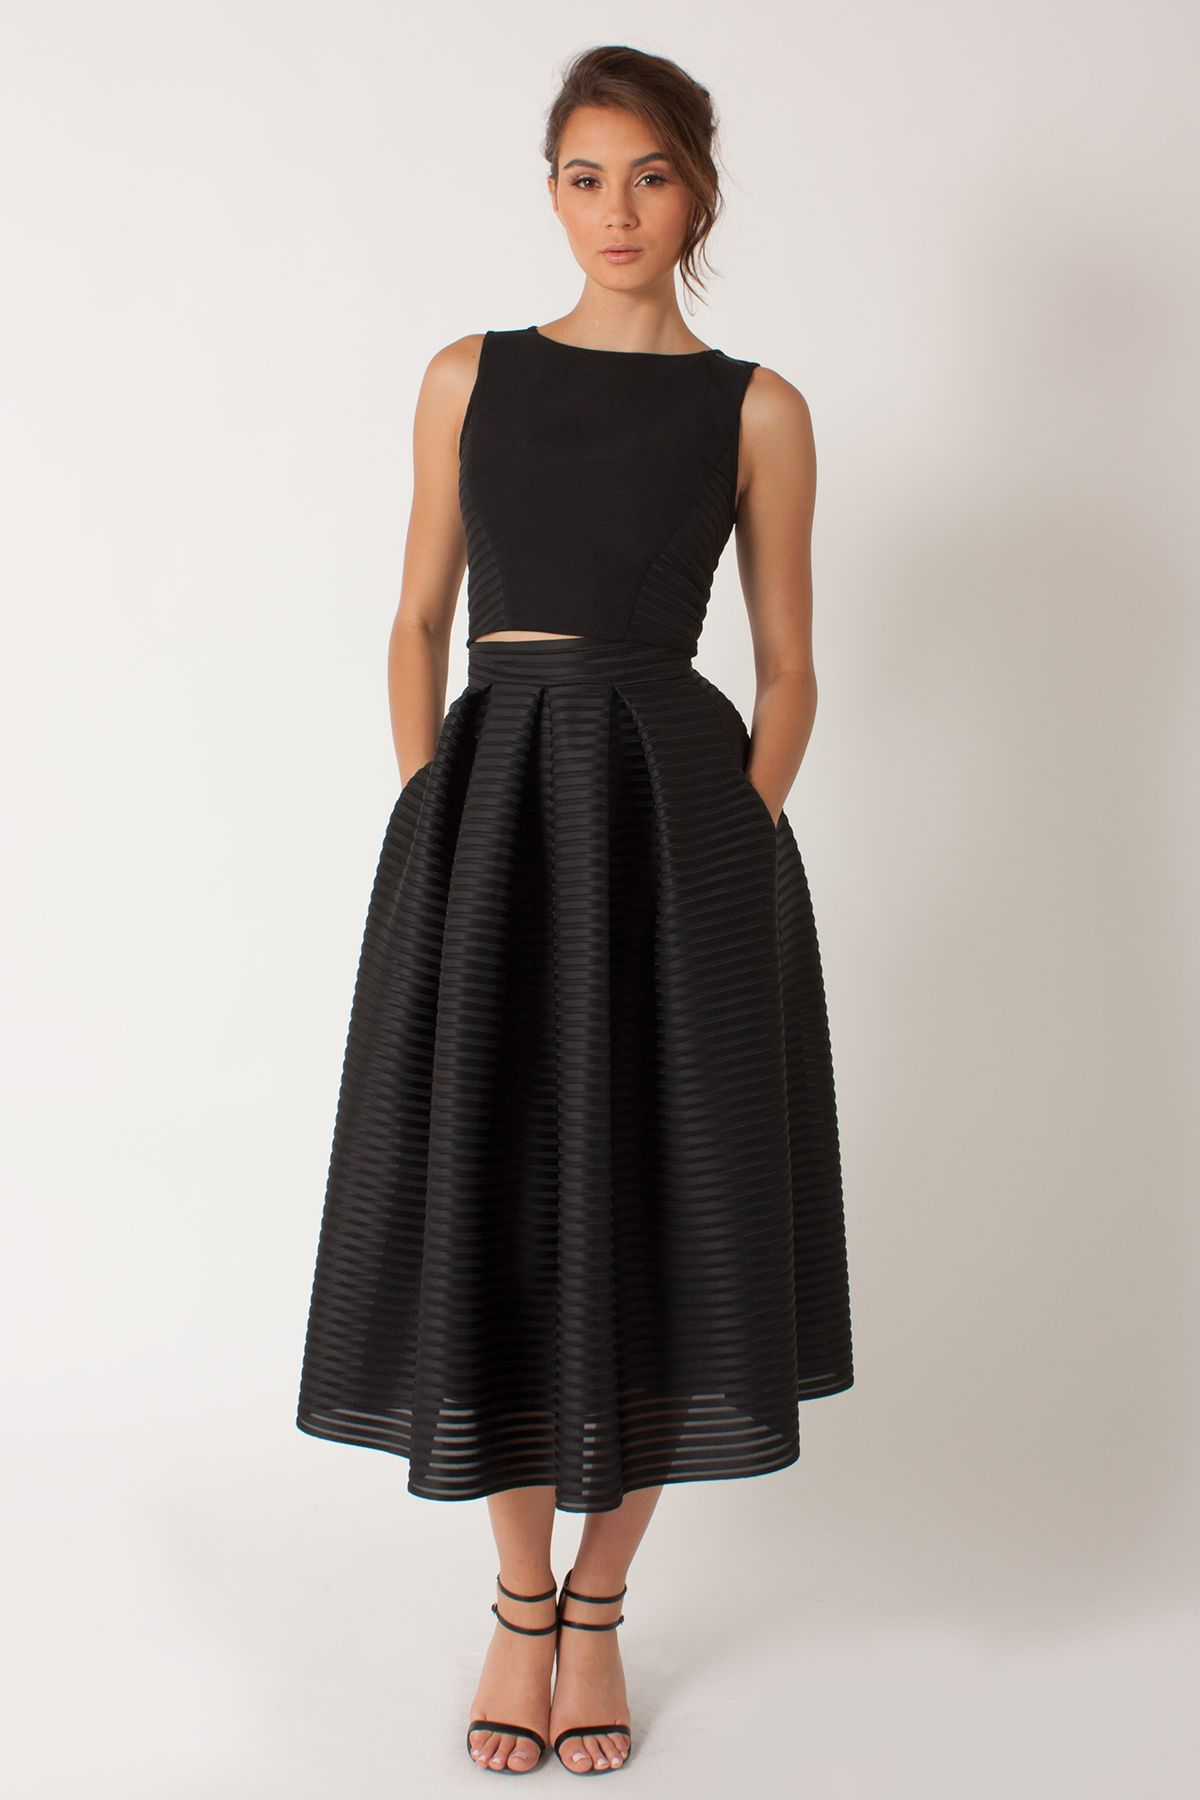 Pin On Fall Fashion Wish List